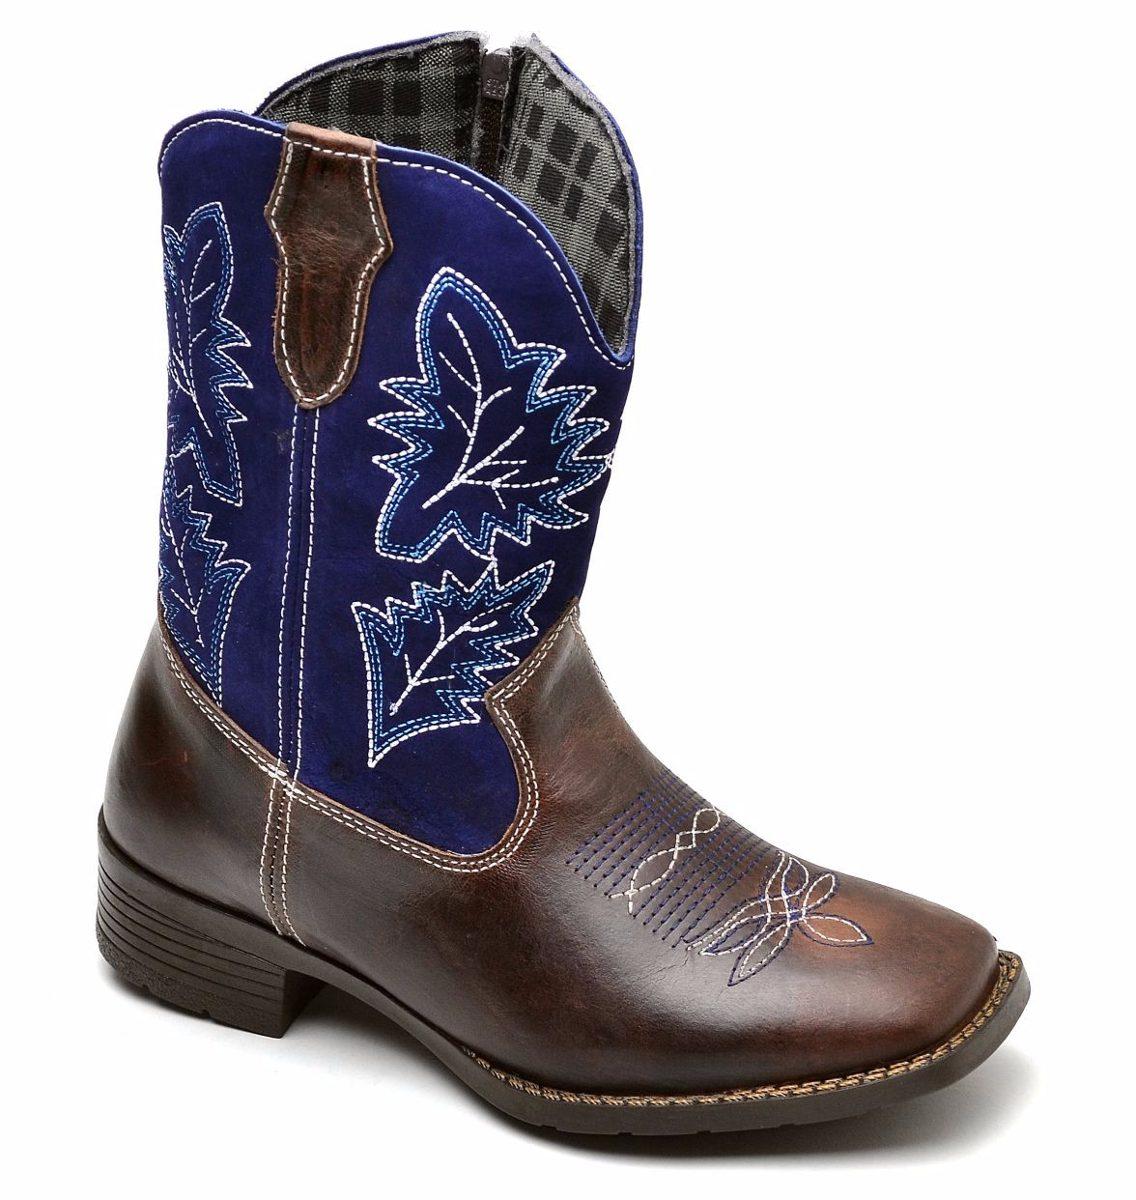 86faf8cc77a bota texana infantil masculina country rodeo western. Carregando zoom.